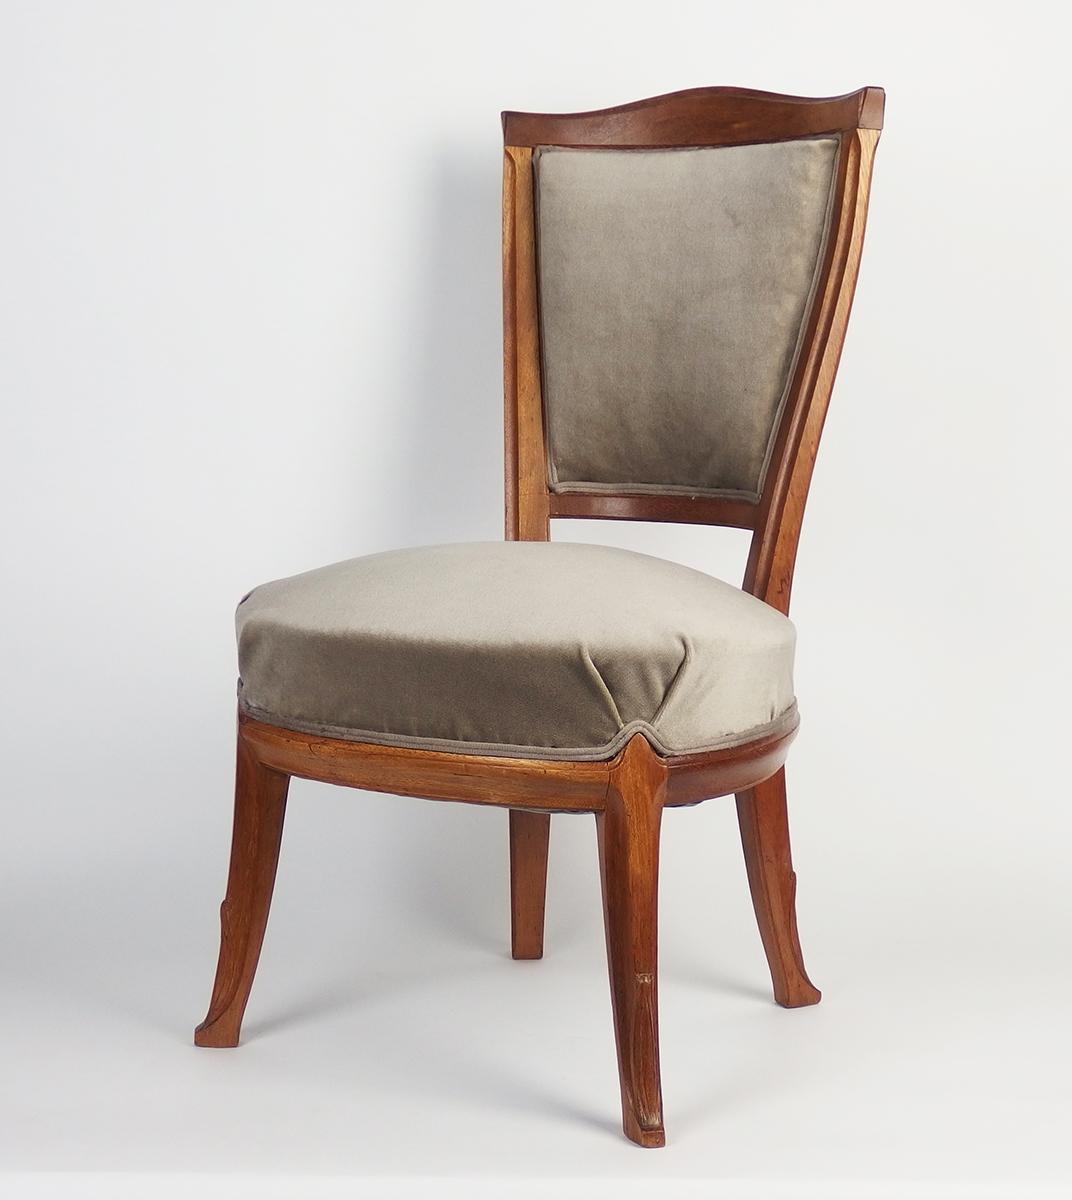 chaise art nouveau attribu e tony selmersheim chaises tabourets. Black Bedroom Furniture Sets. Home Design Ideas